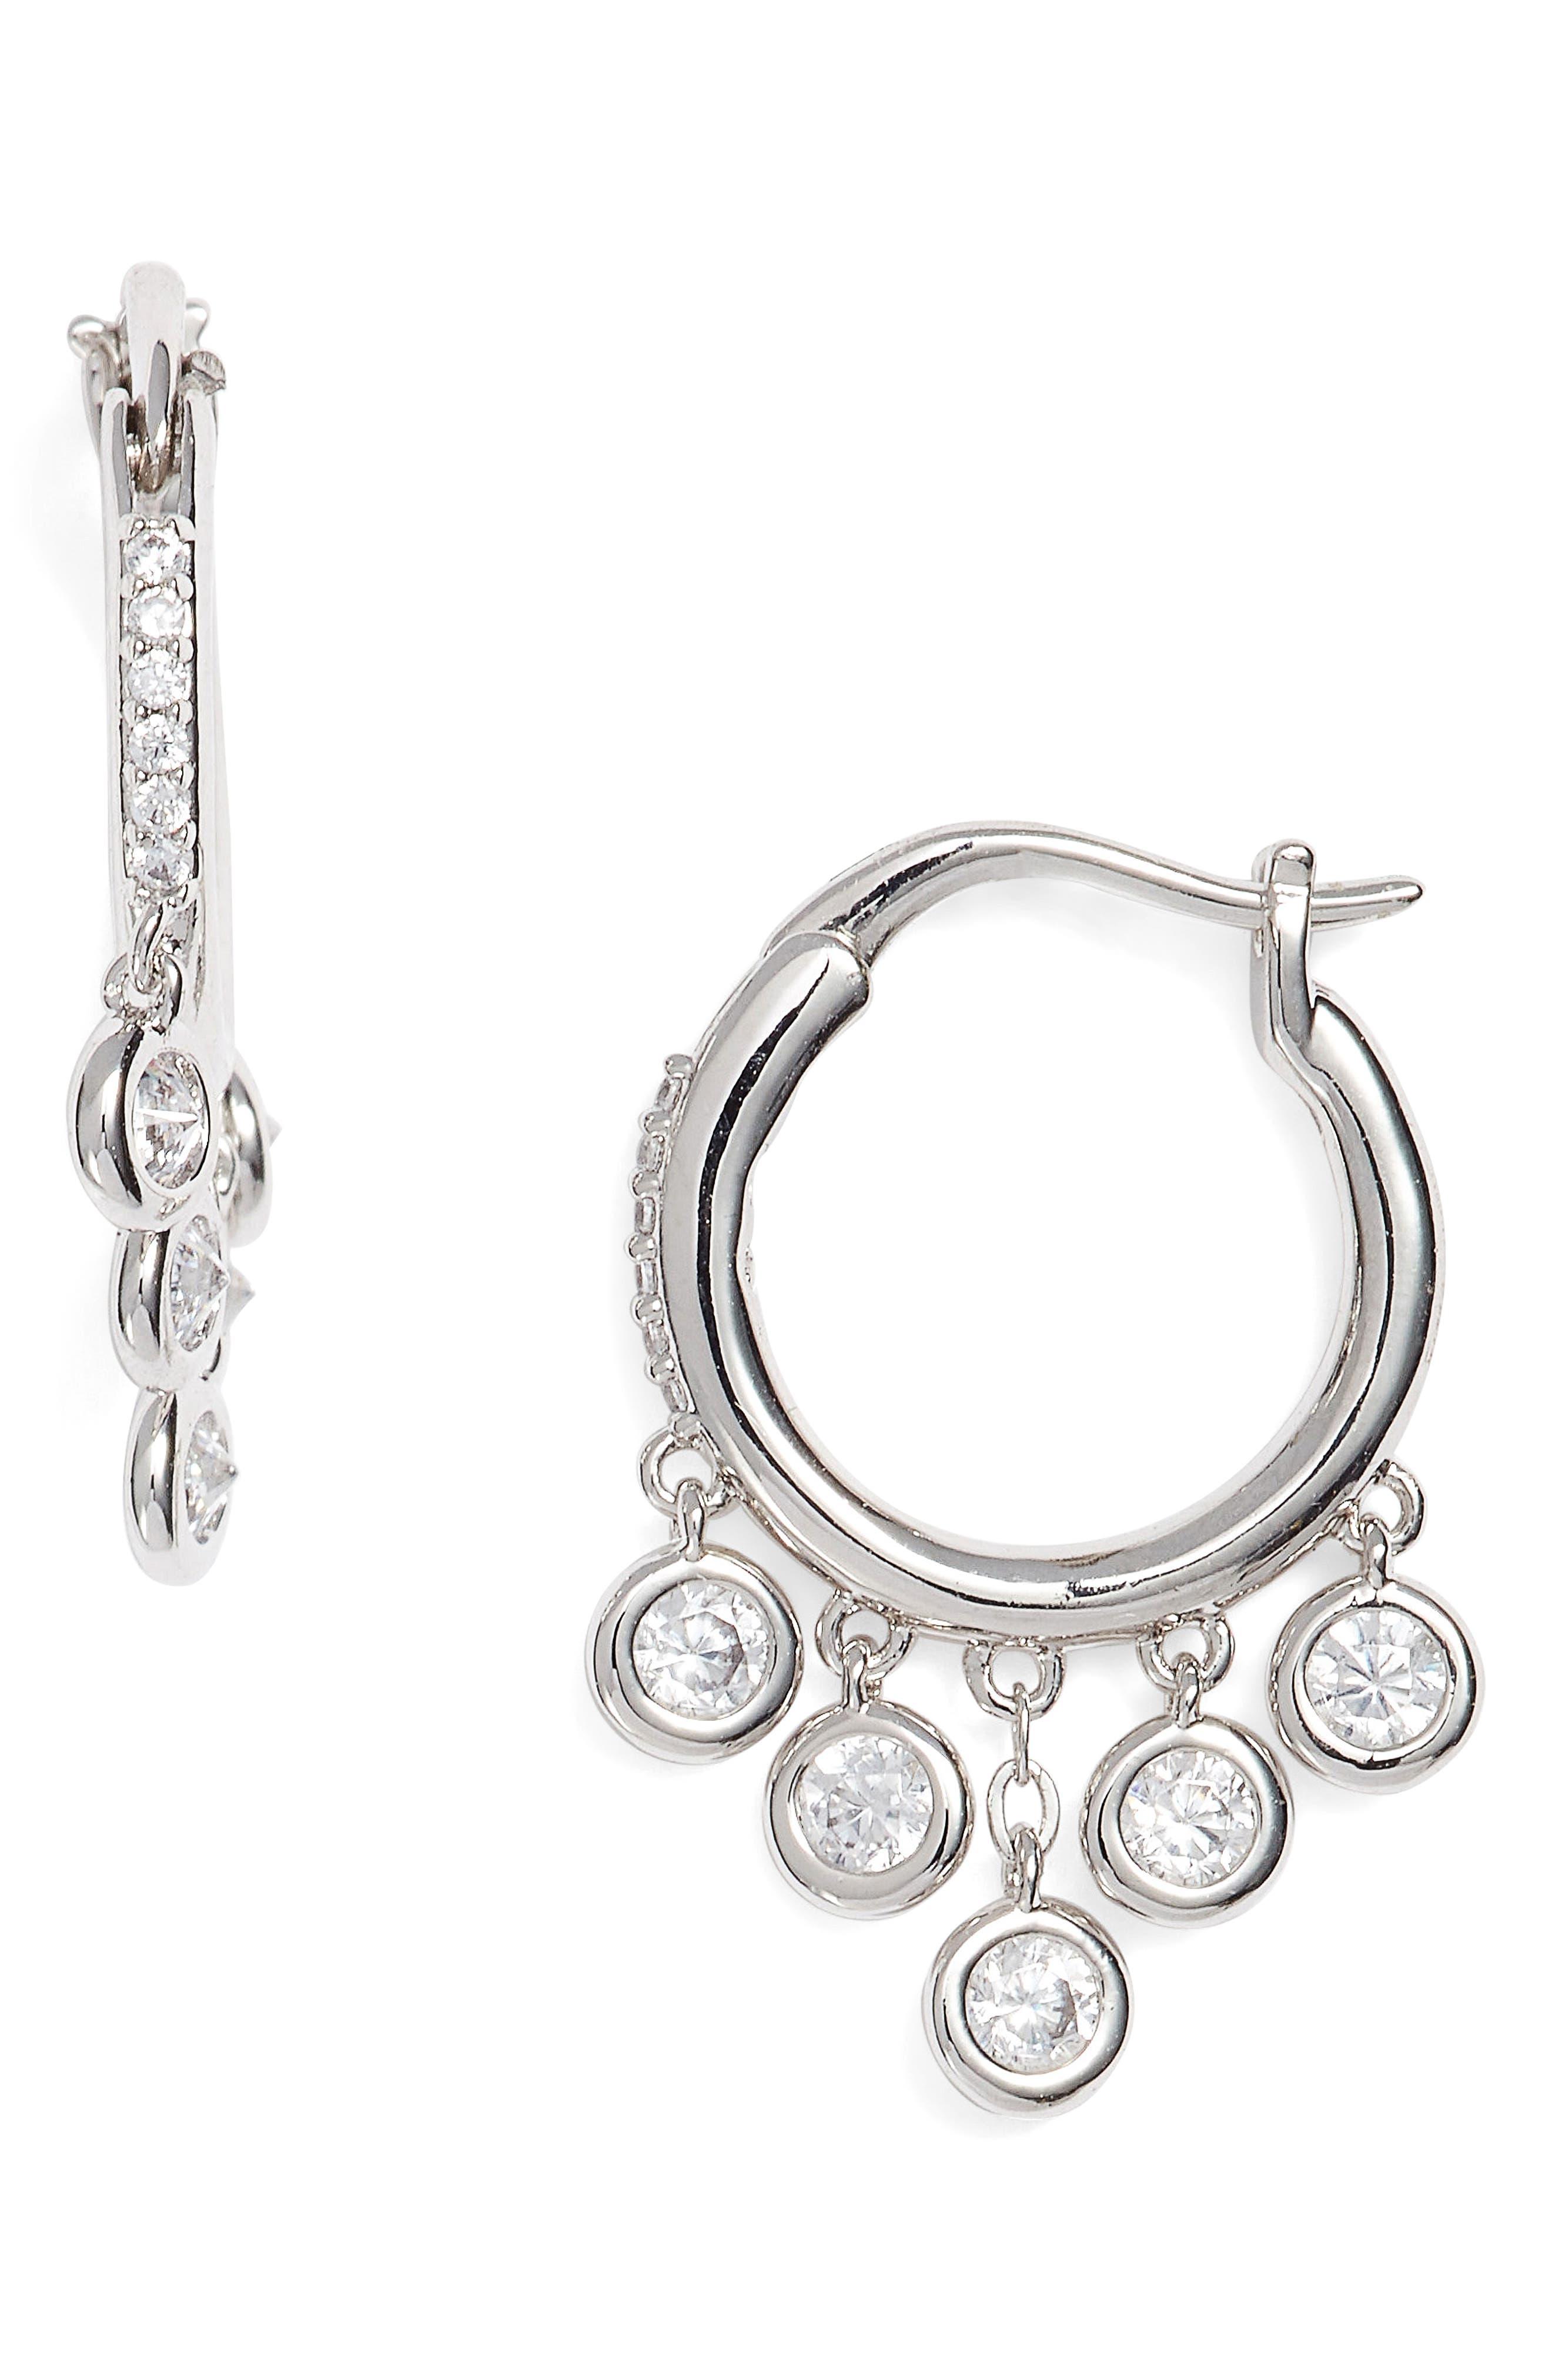 Cubic Zirconia Hoop Earrings,                             Main thumbnail 1, color,                             Silver